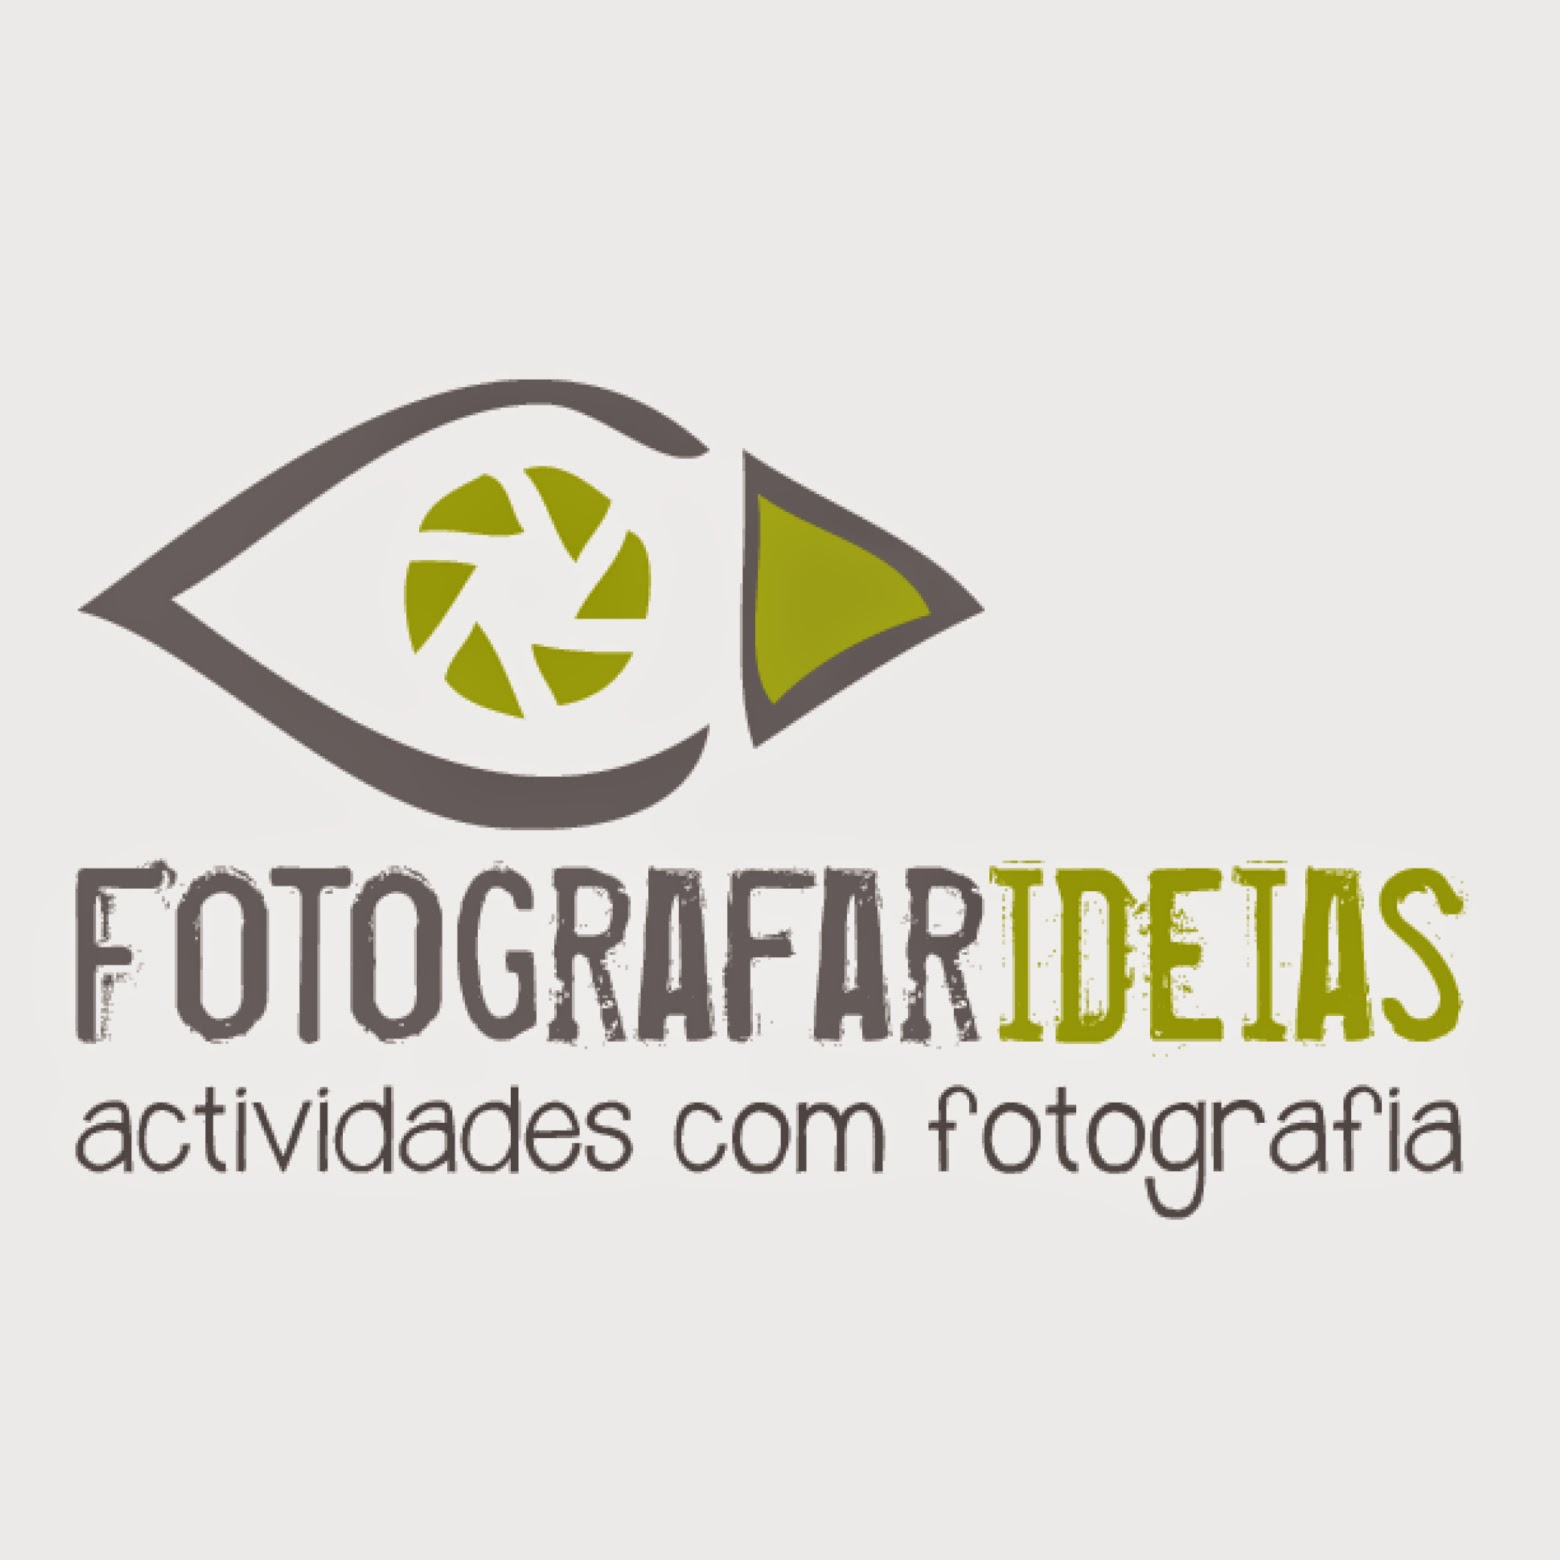 https://www.facebook.com/FotografarIdeias